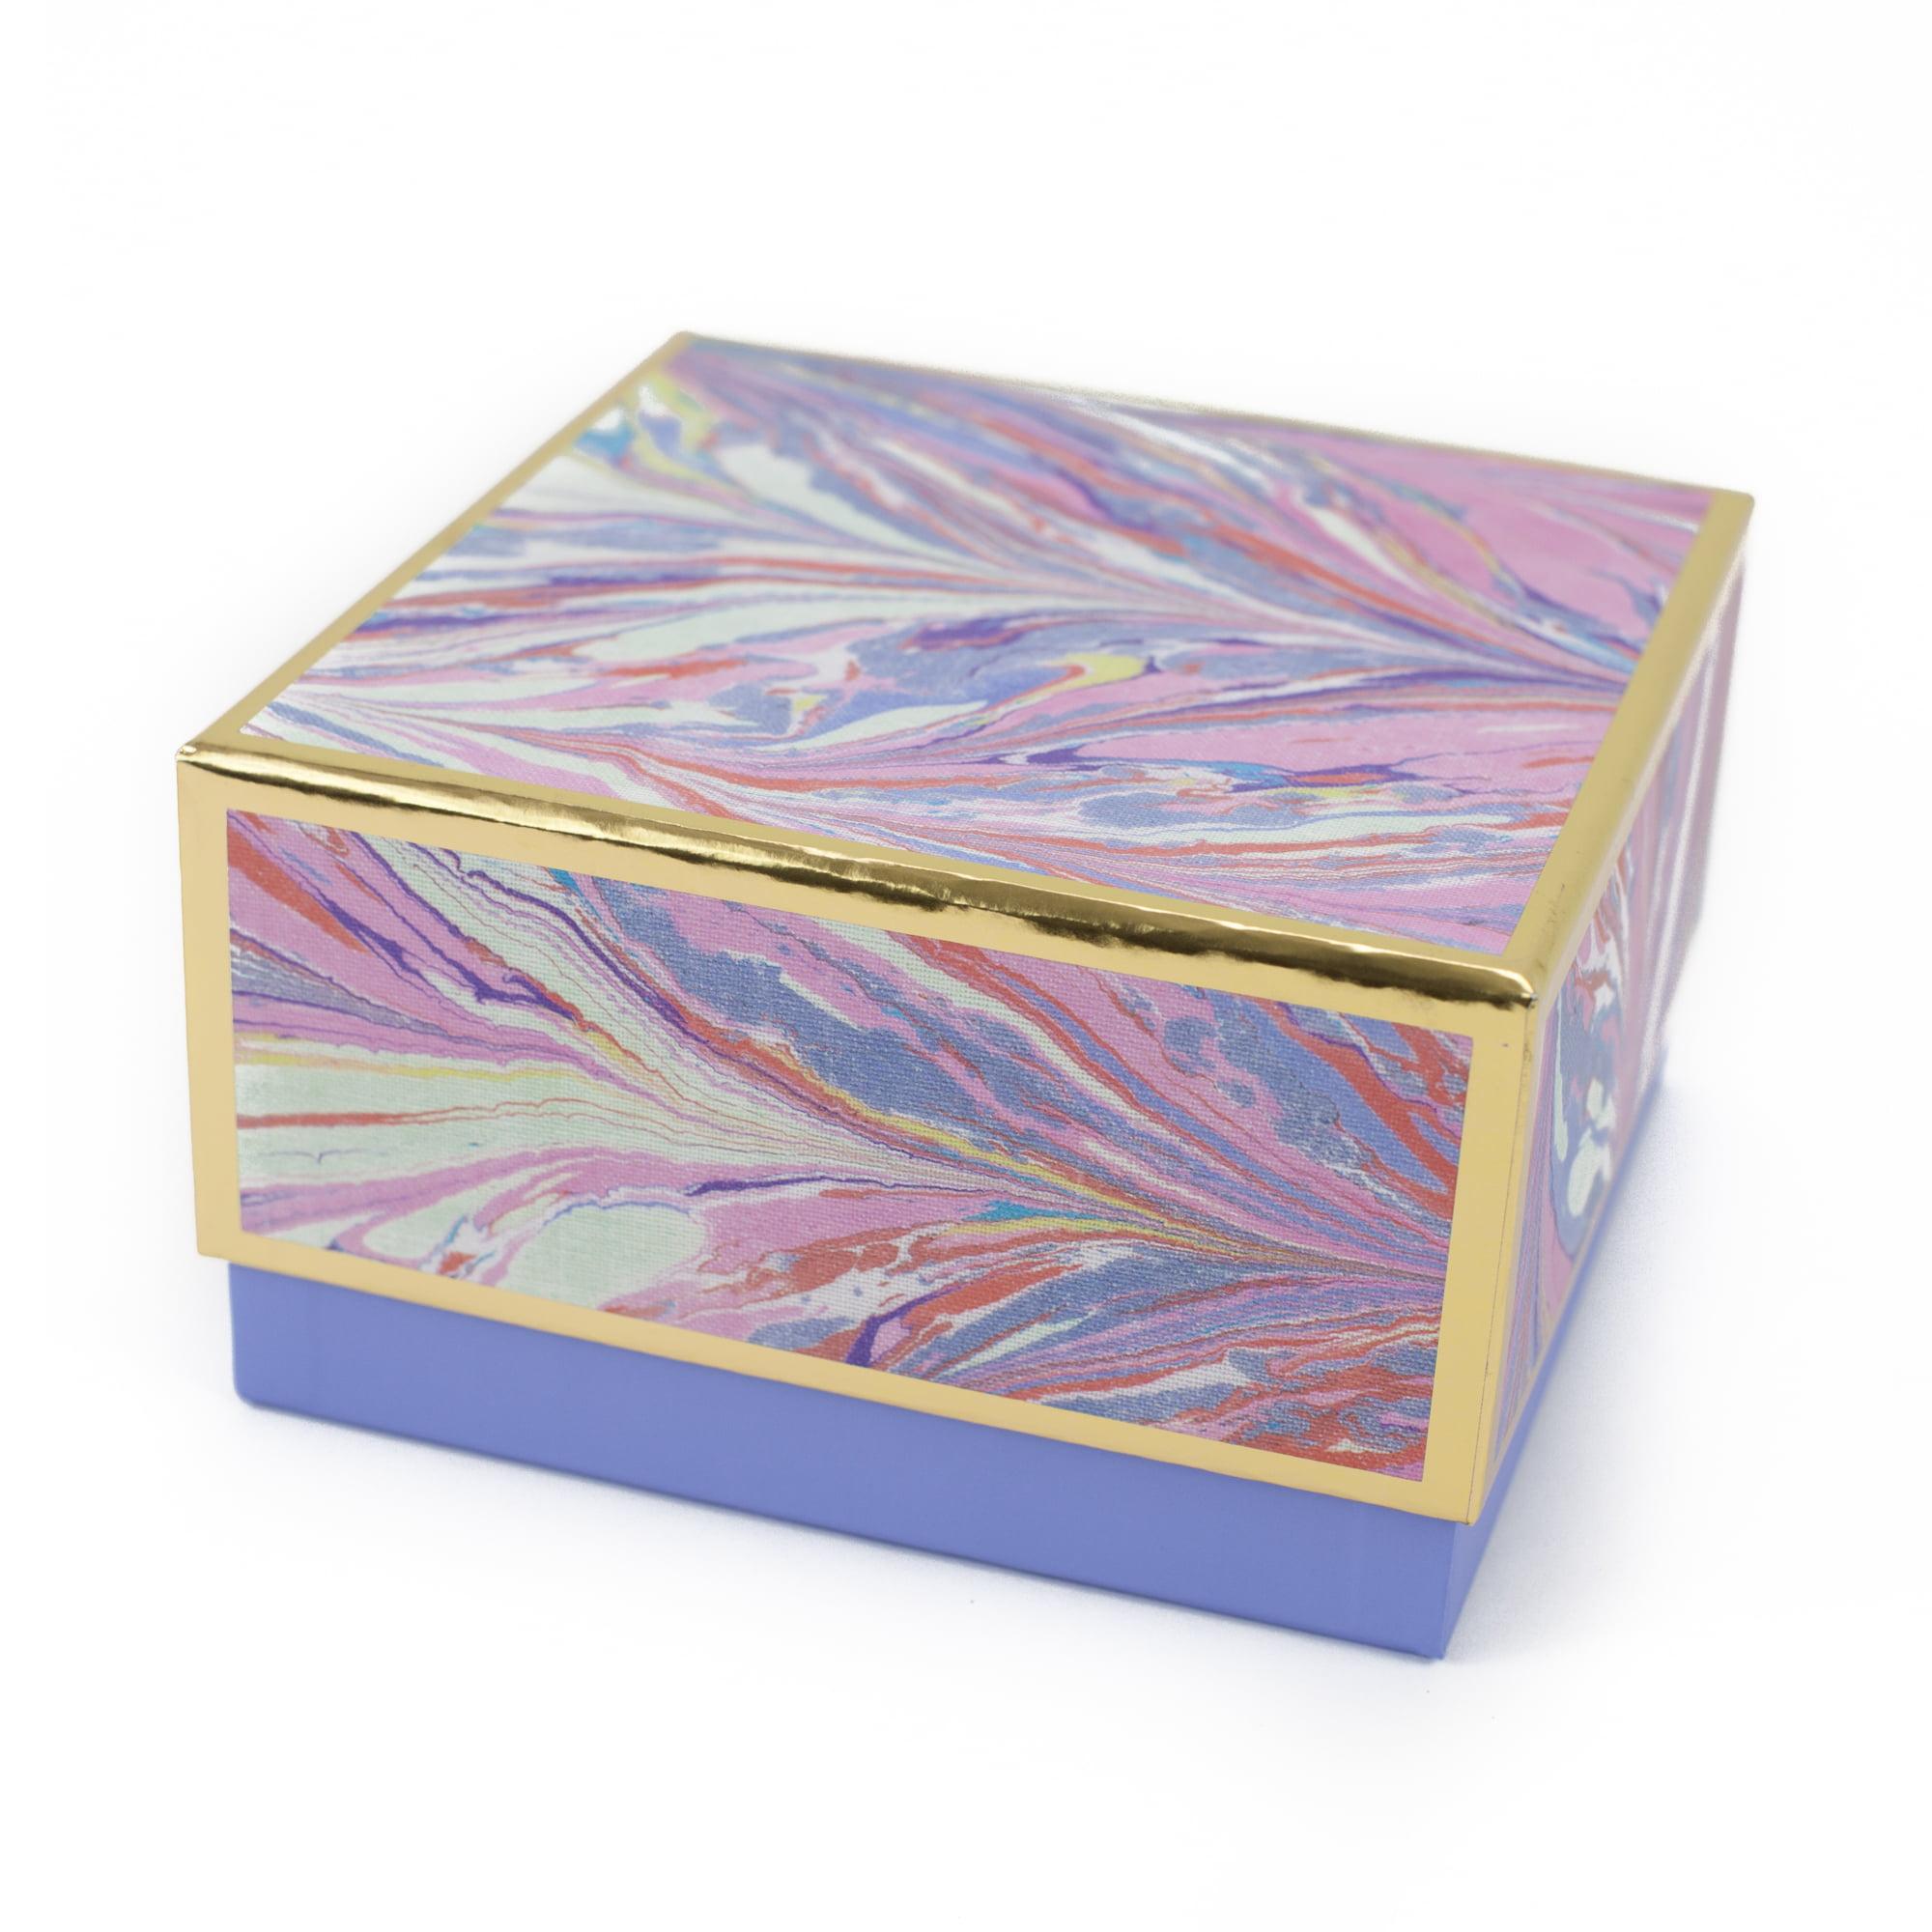 Hallmark Signature, Marble, Medium Gift Box